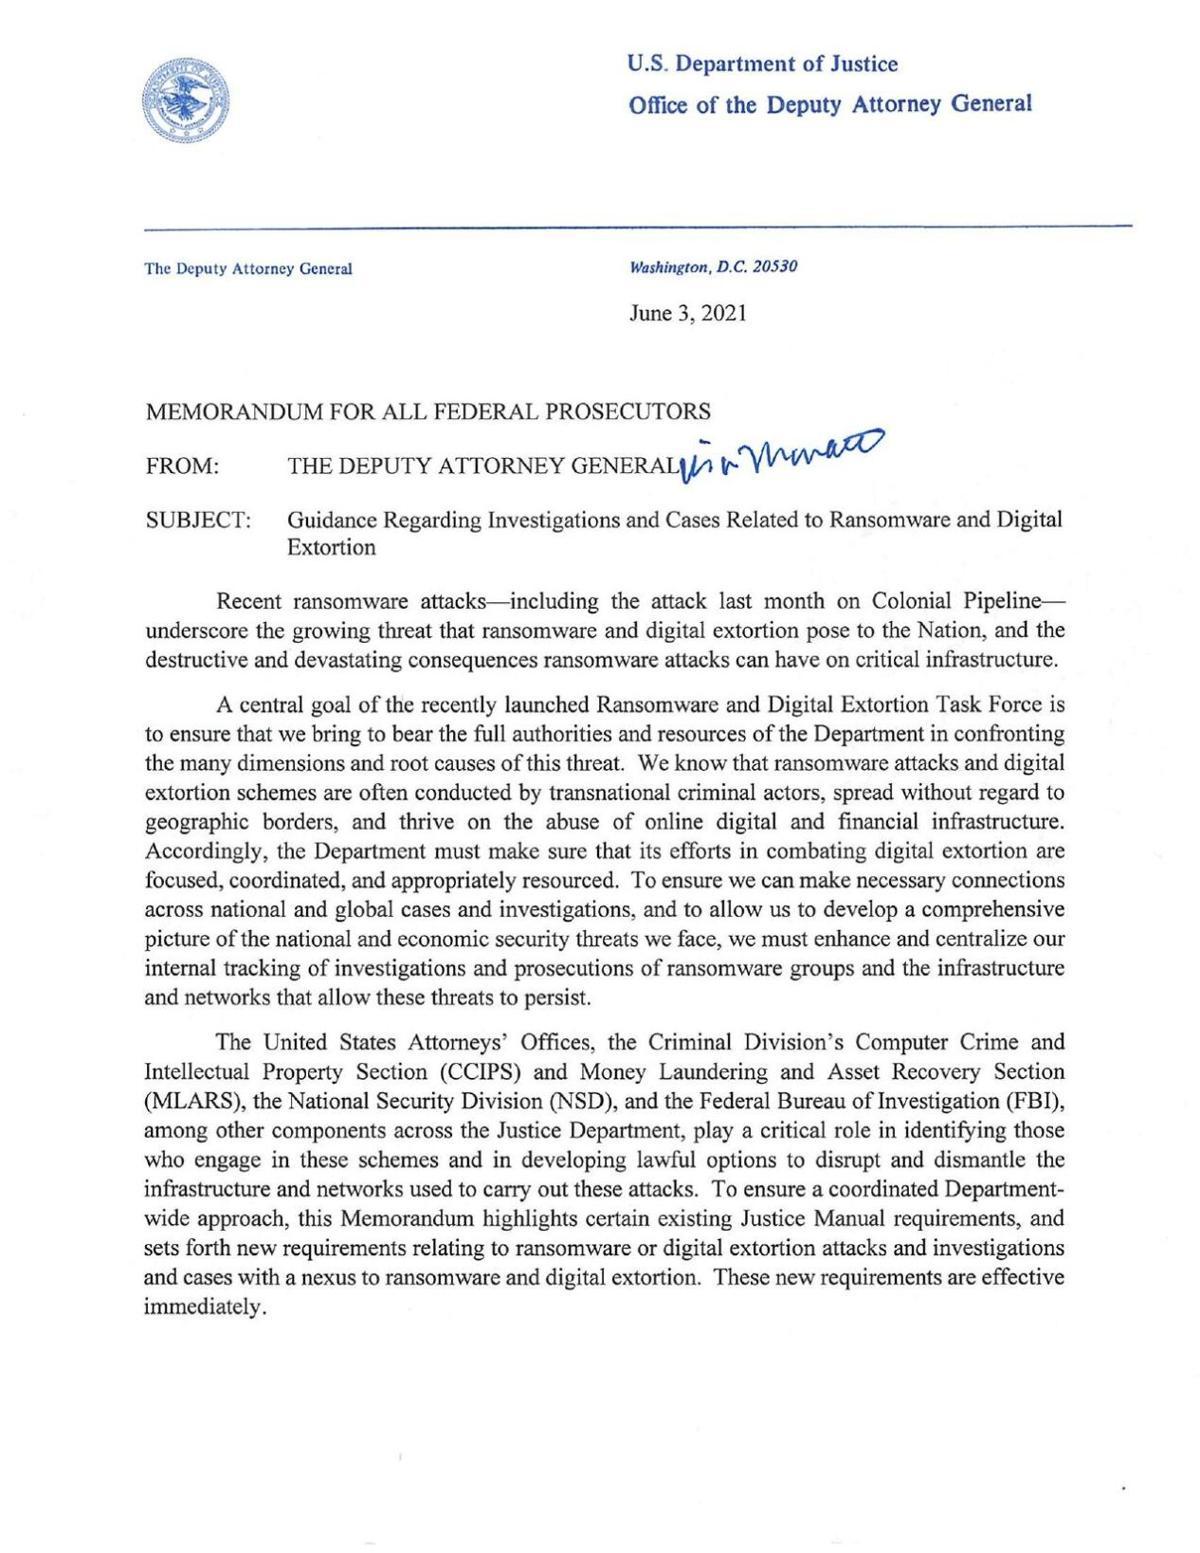 Memorandum Ransomware and Digital Extortion